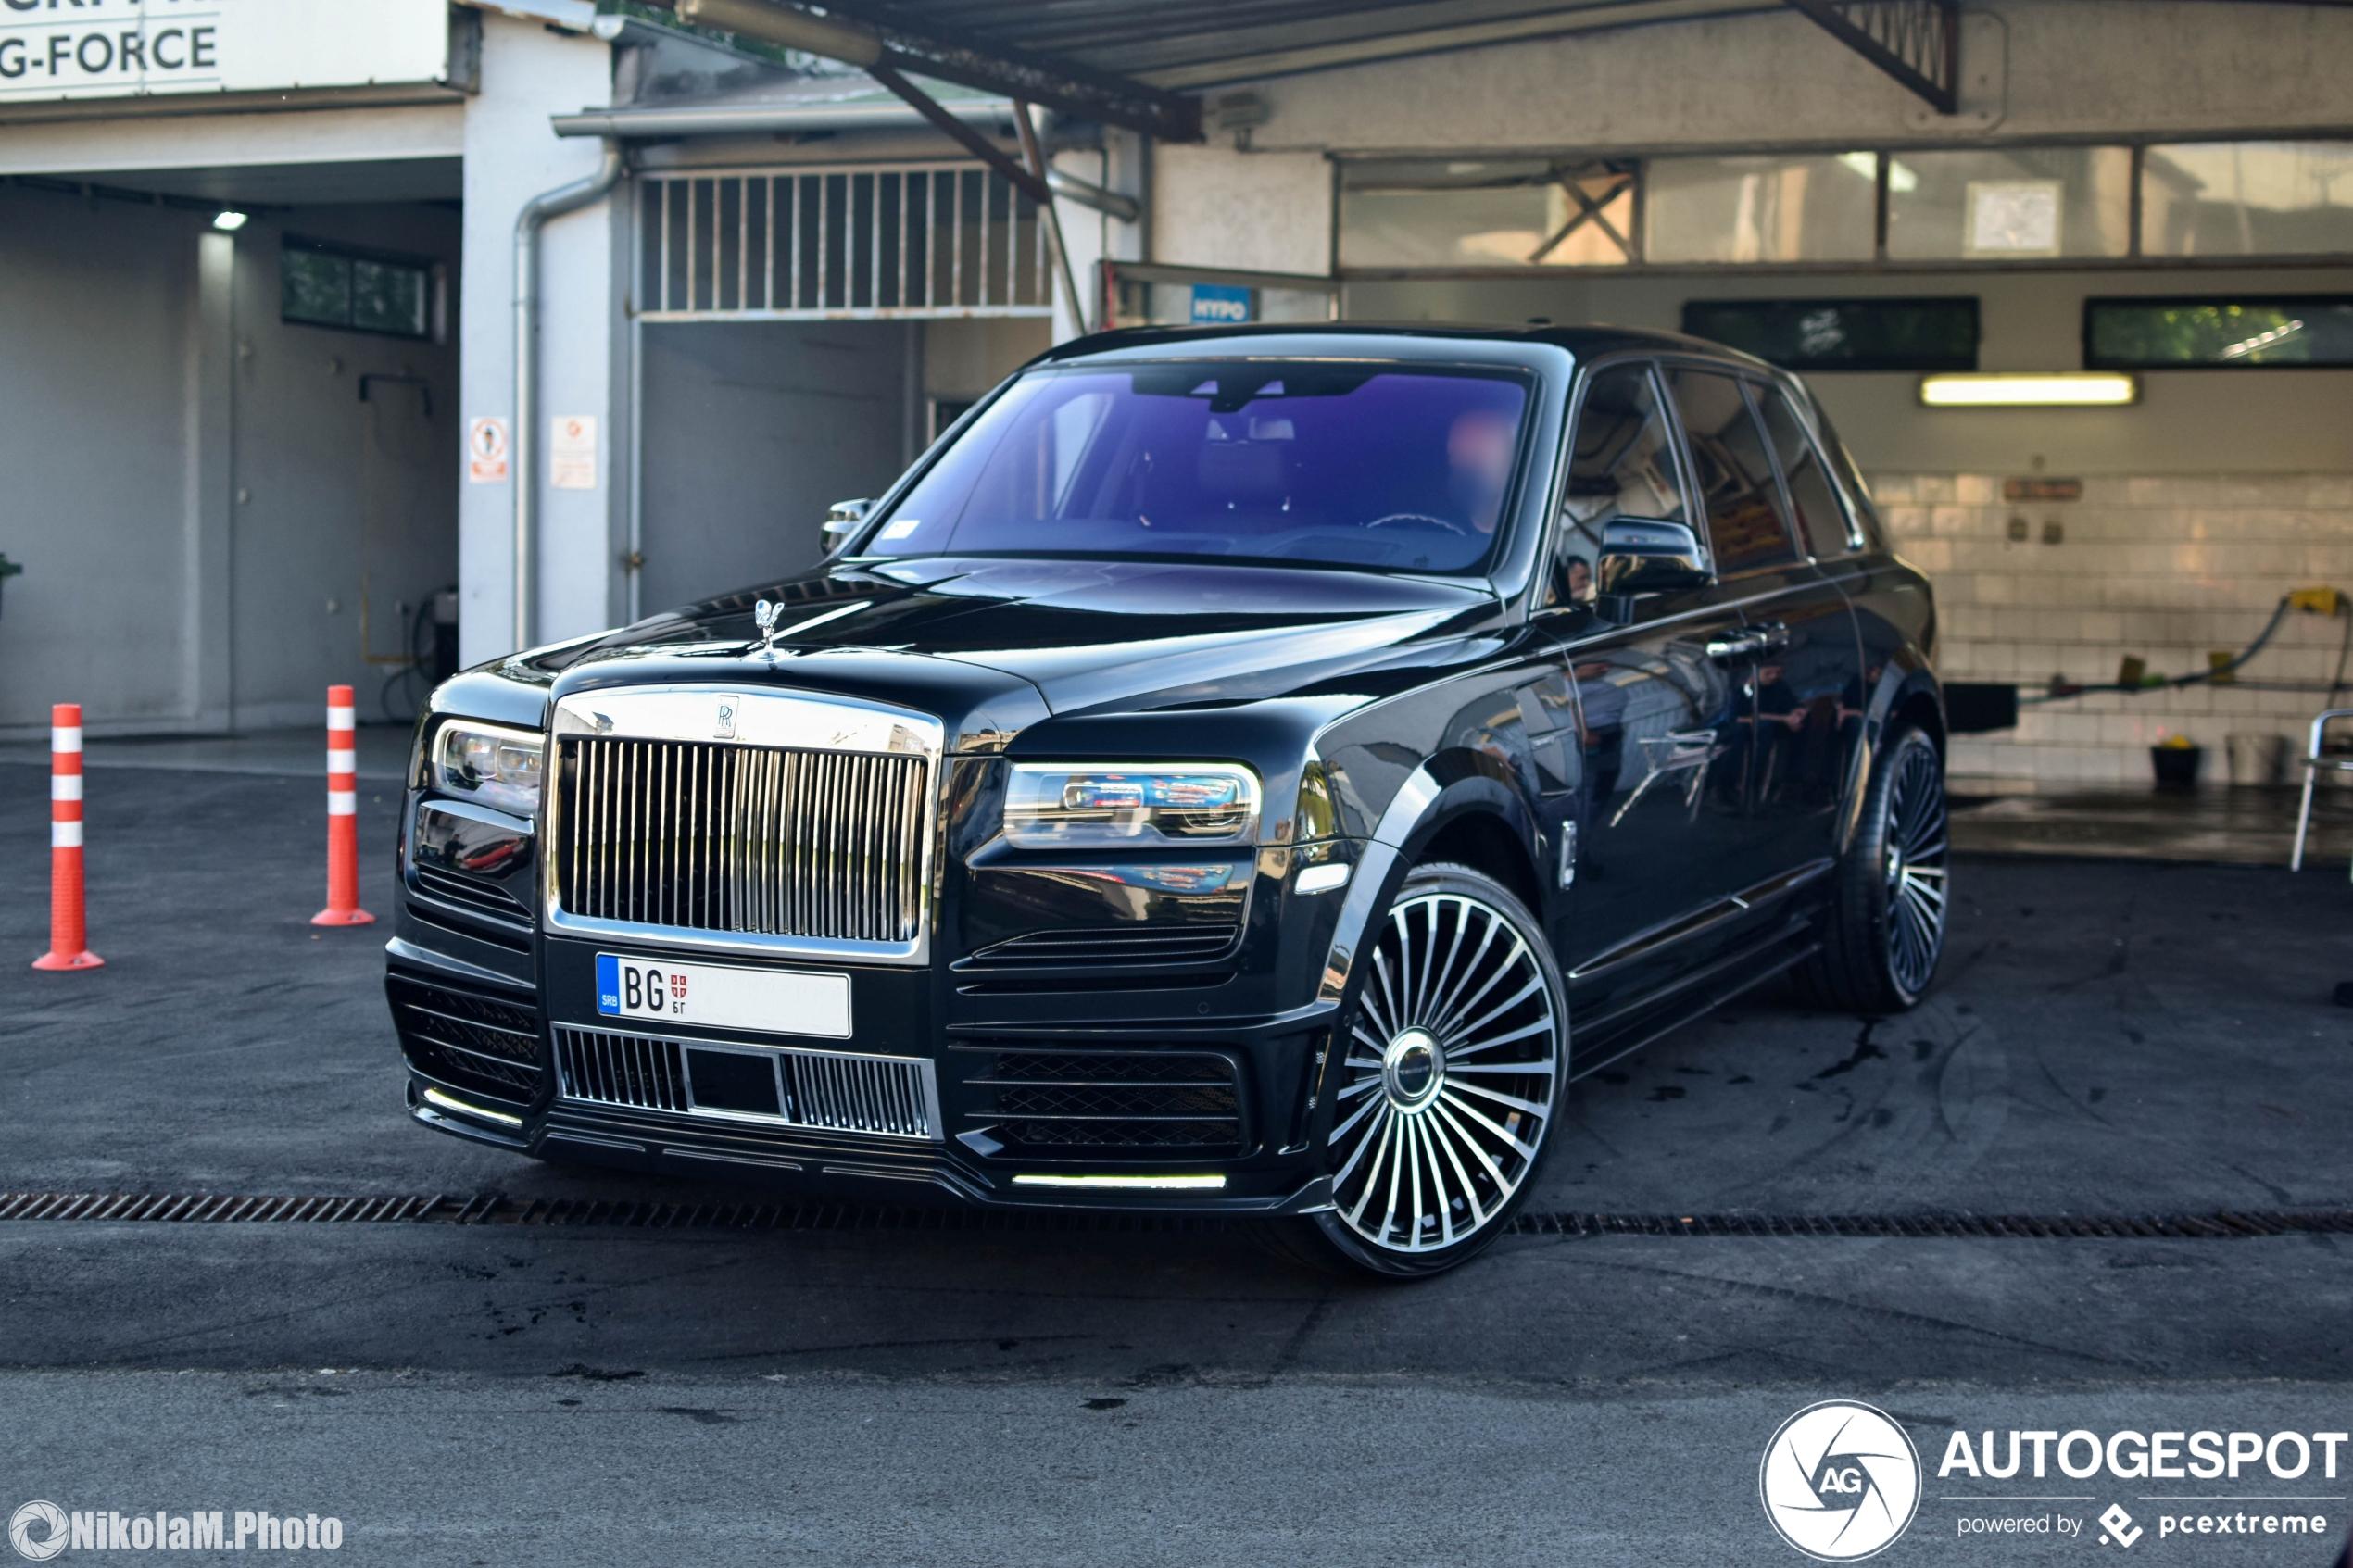 Mansory bodykit maakt de Rolls-Royce Cullinan ordinair